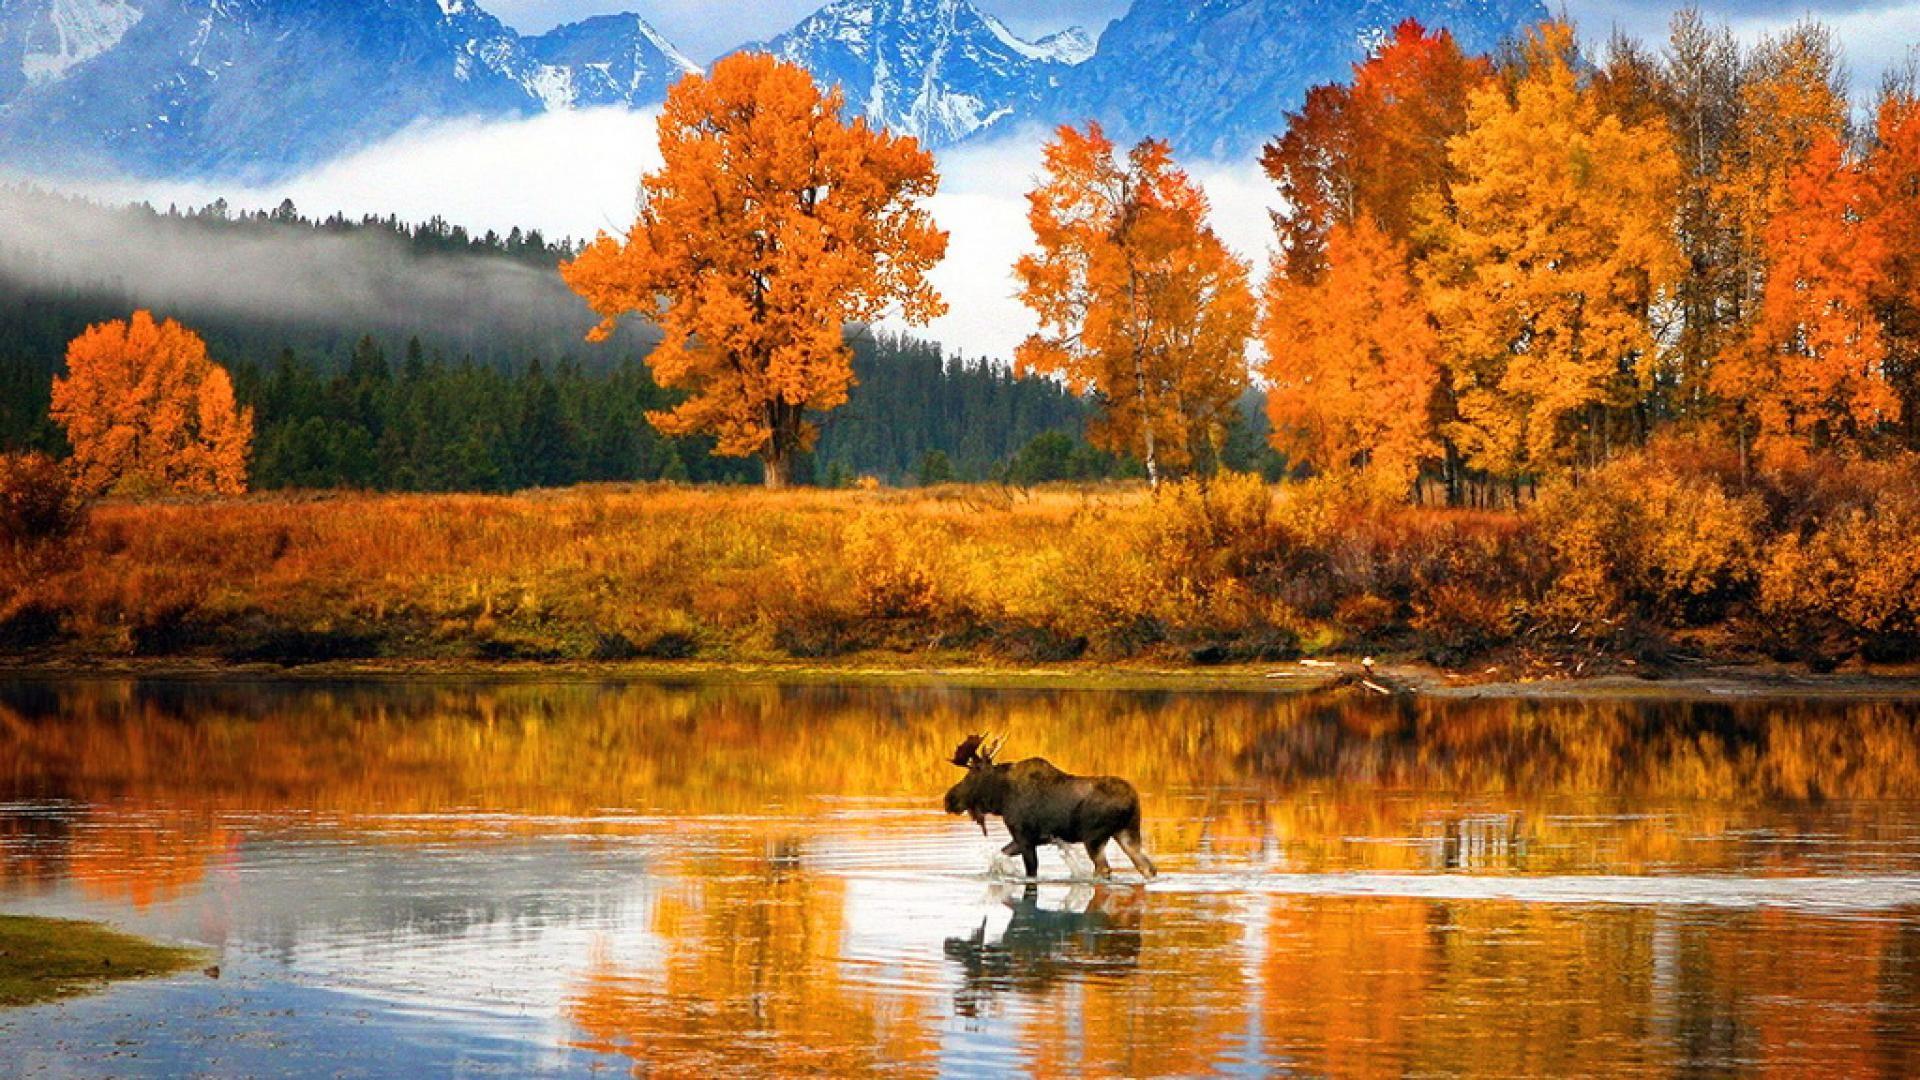 Download Alaska Moose Wallpaper For Windows #hKP3D ...